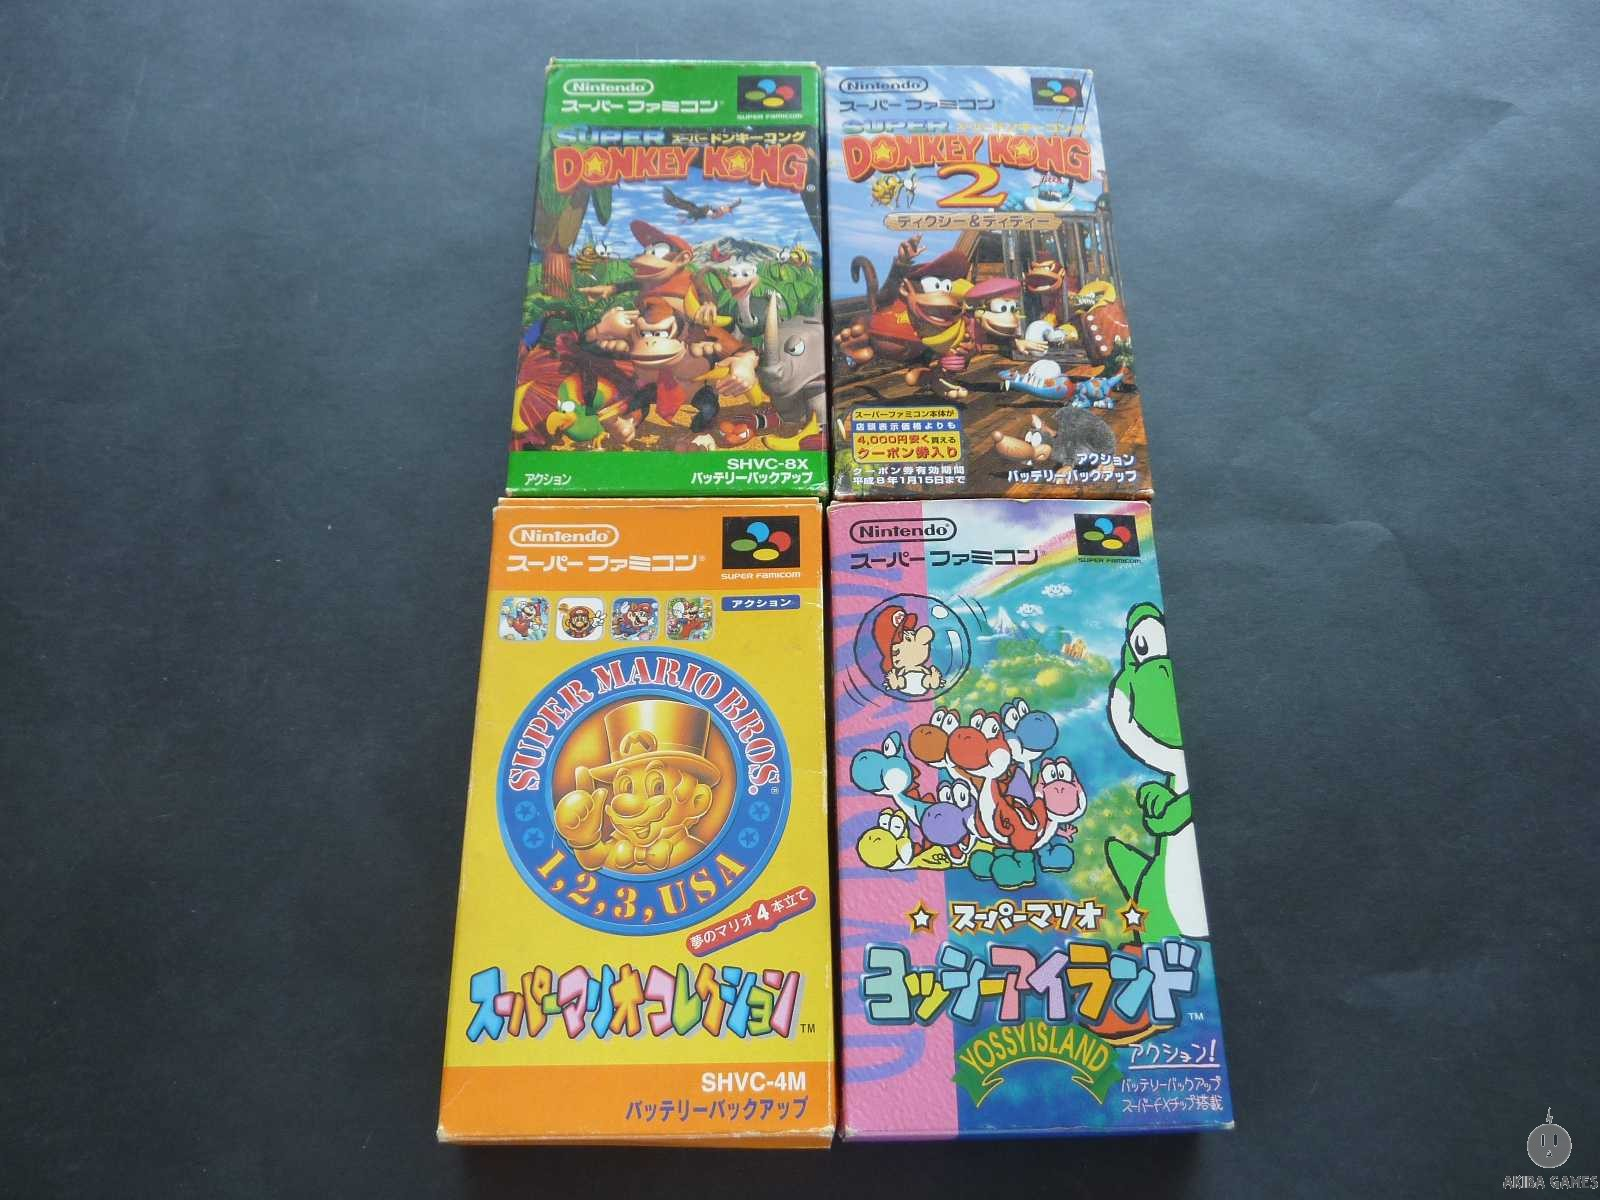 [SFC] Super Donkey Kong,Super Donkey Kong 2 : Dixie & Diddy set of 4 games